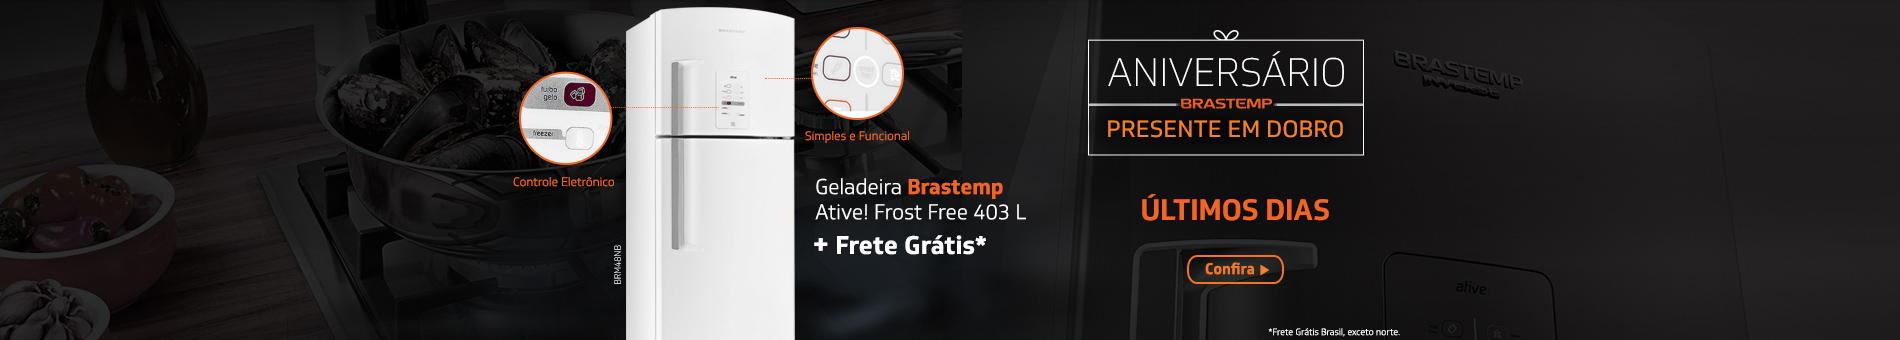 Promoção Interna - 769 - presenteemdobro_BRM48NB_home2_26082016 - BRM48NB - 2